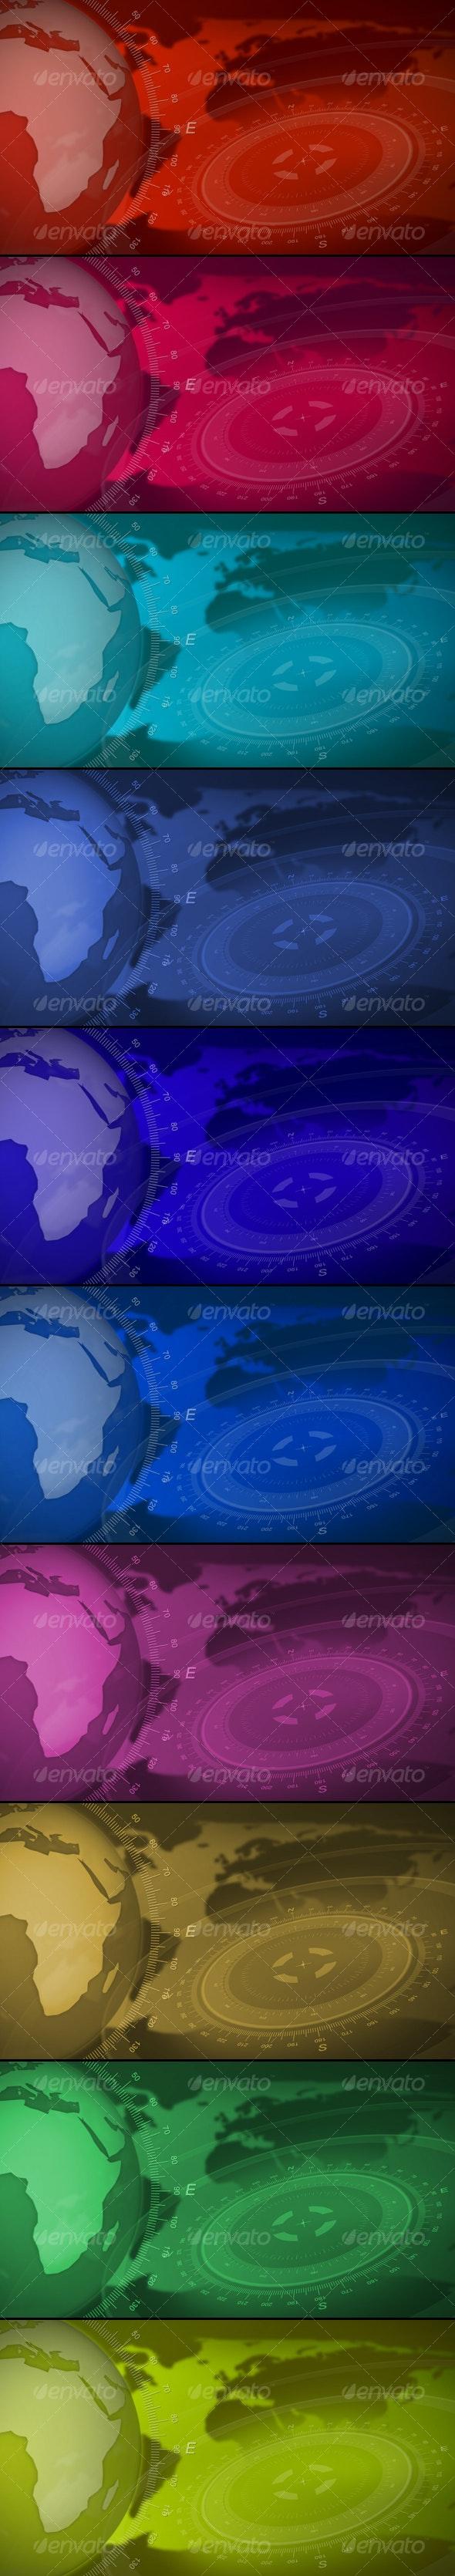 Broadcast Design Backgrounds - Backgrounds Graphics